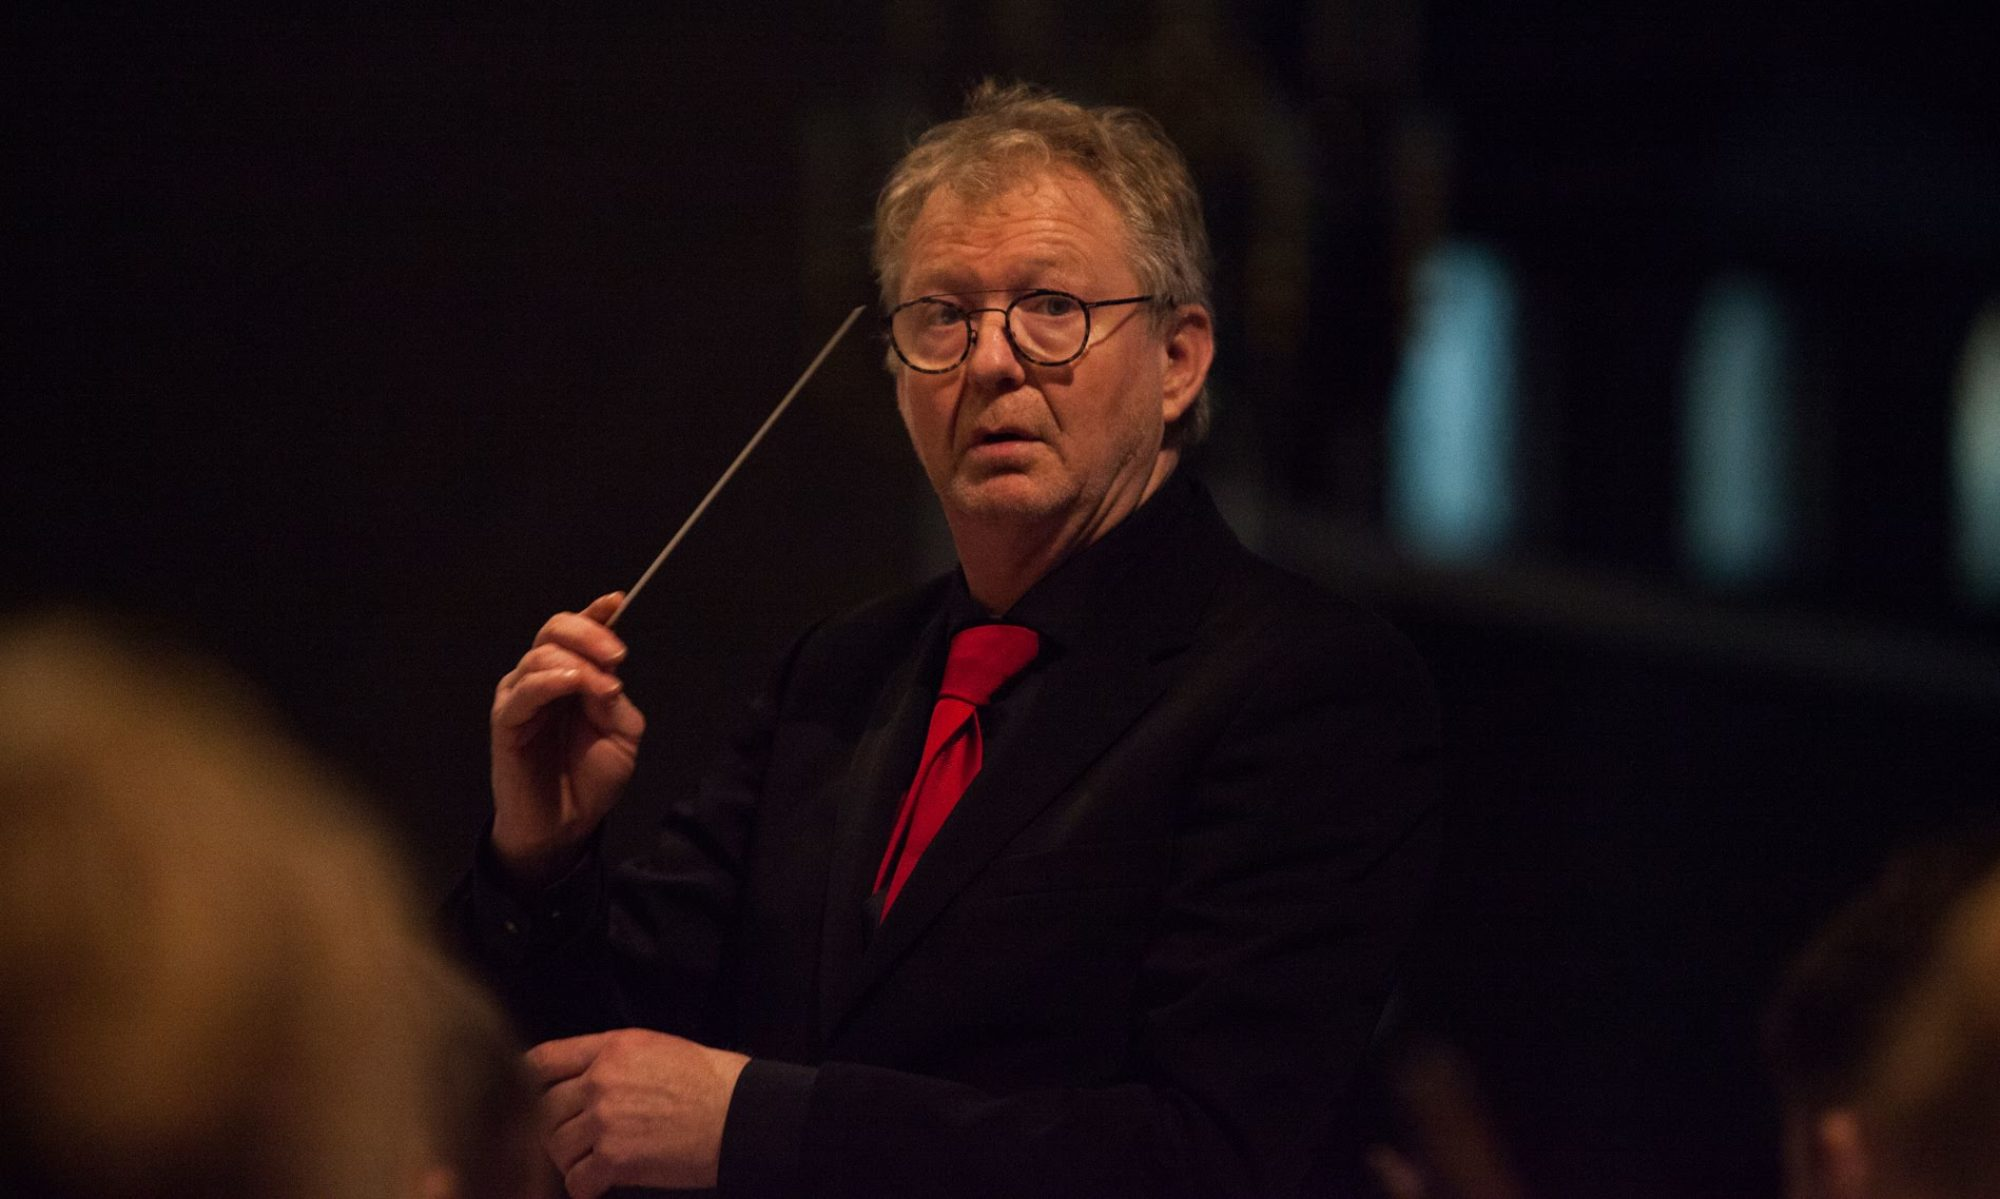 Dick Hesselink